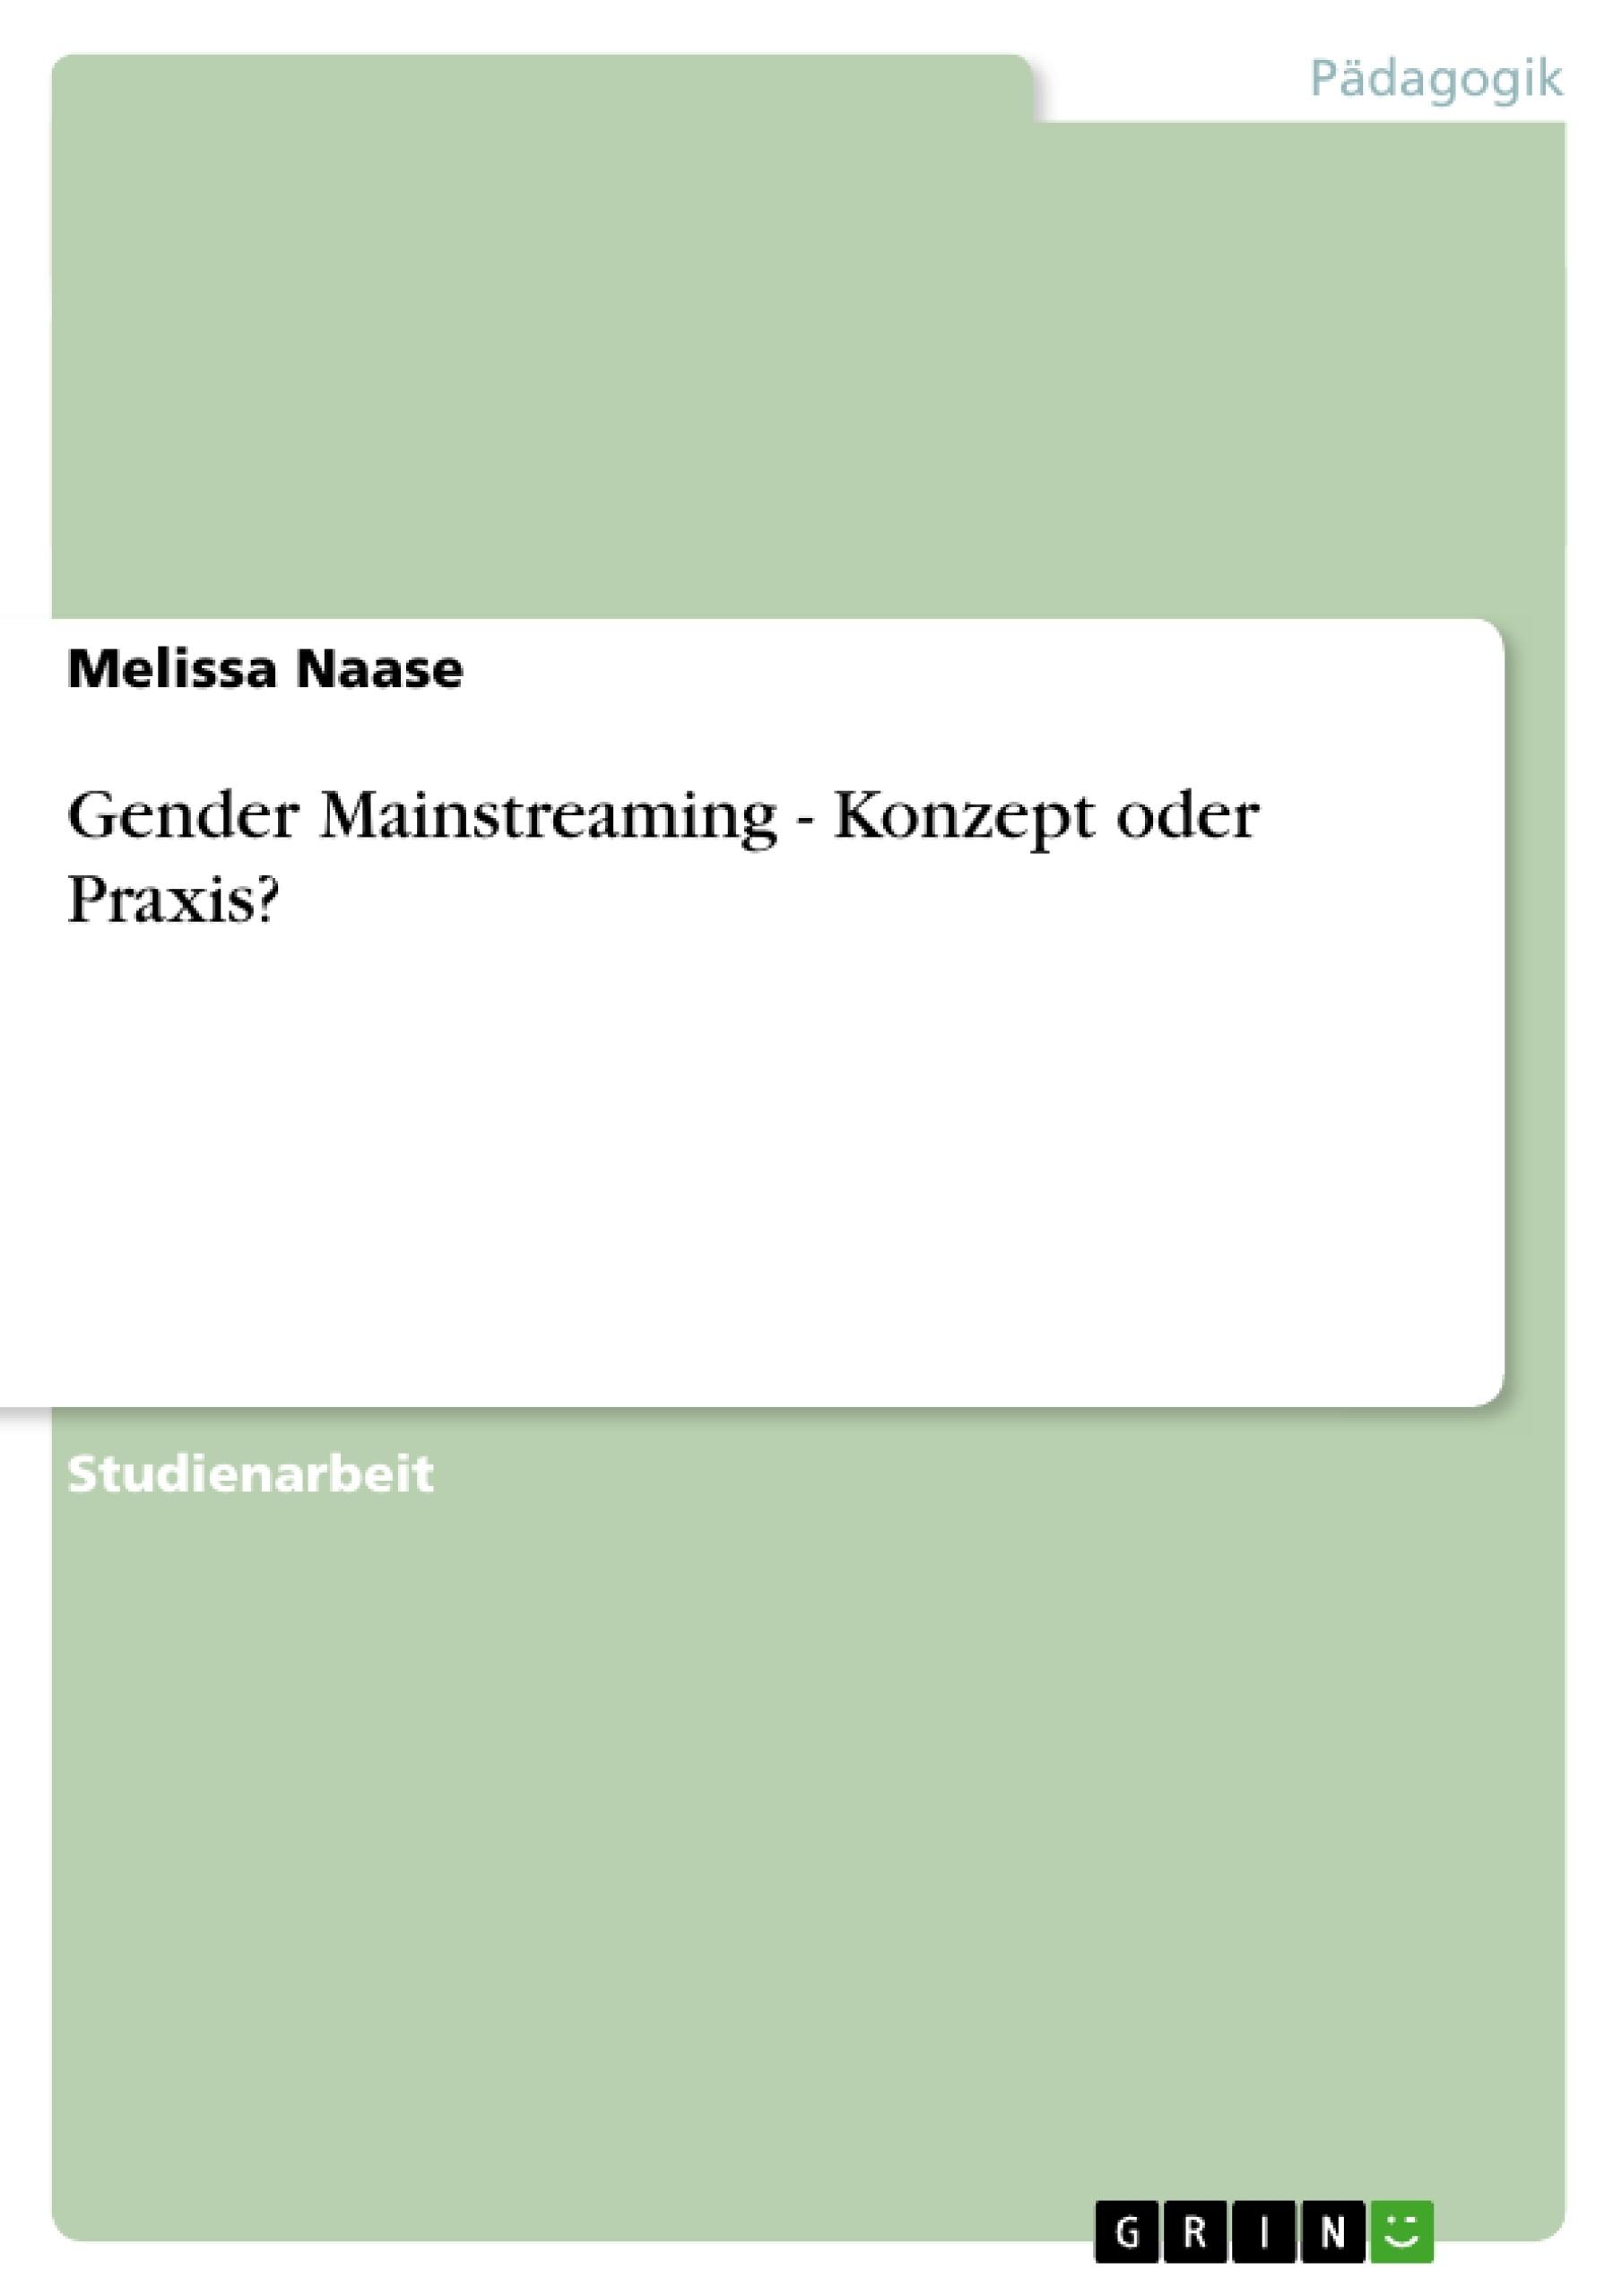 Titel: Gender Mainstreaming - Konzept oder Praxis?